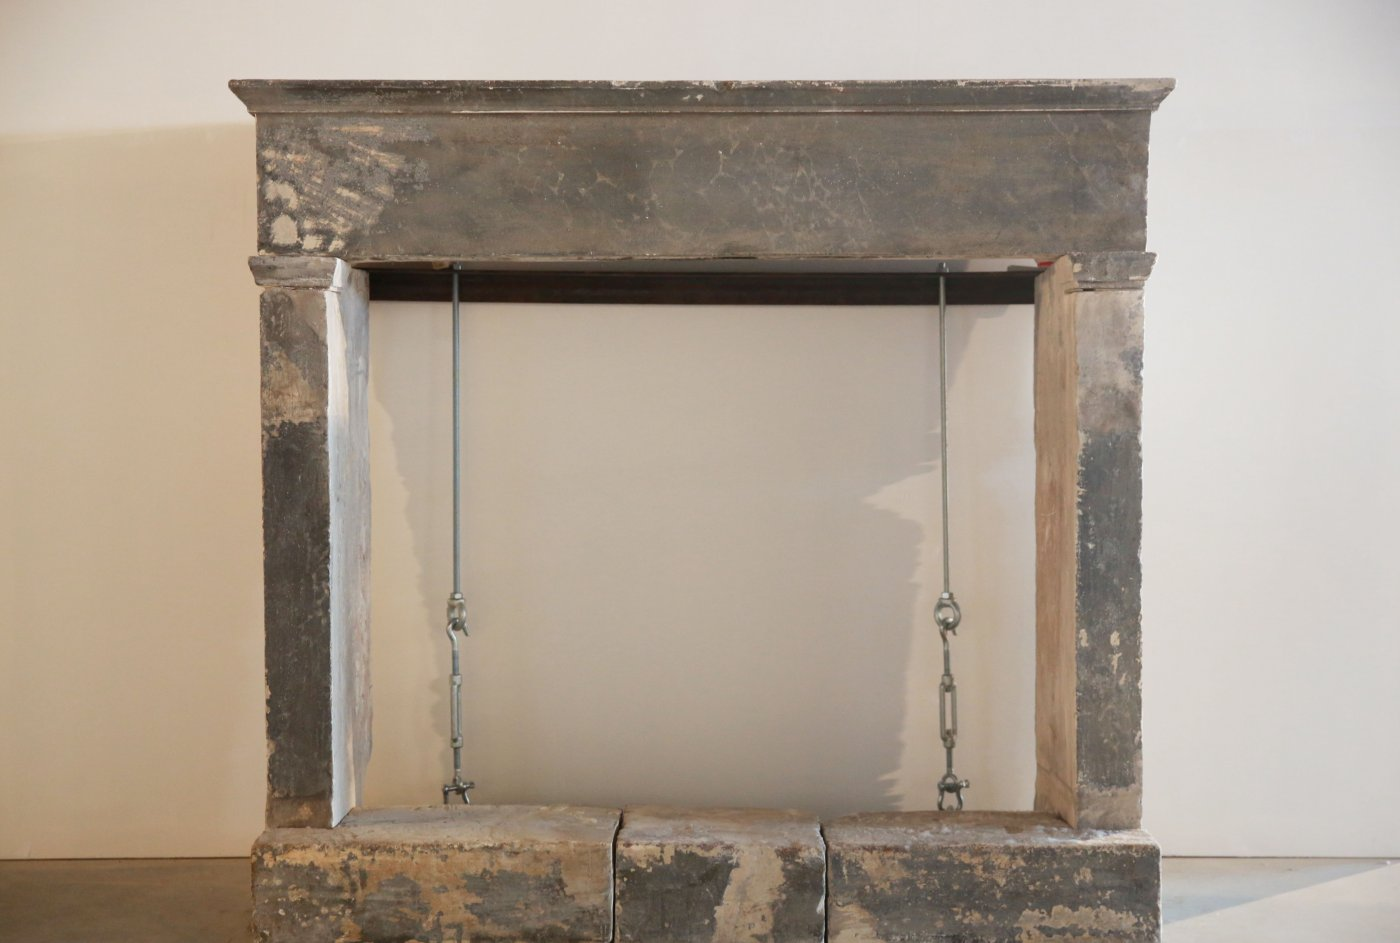 Antique French Fireplace De Opkamer Antique Floors And